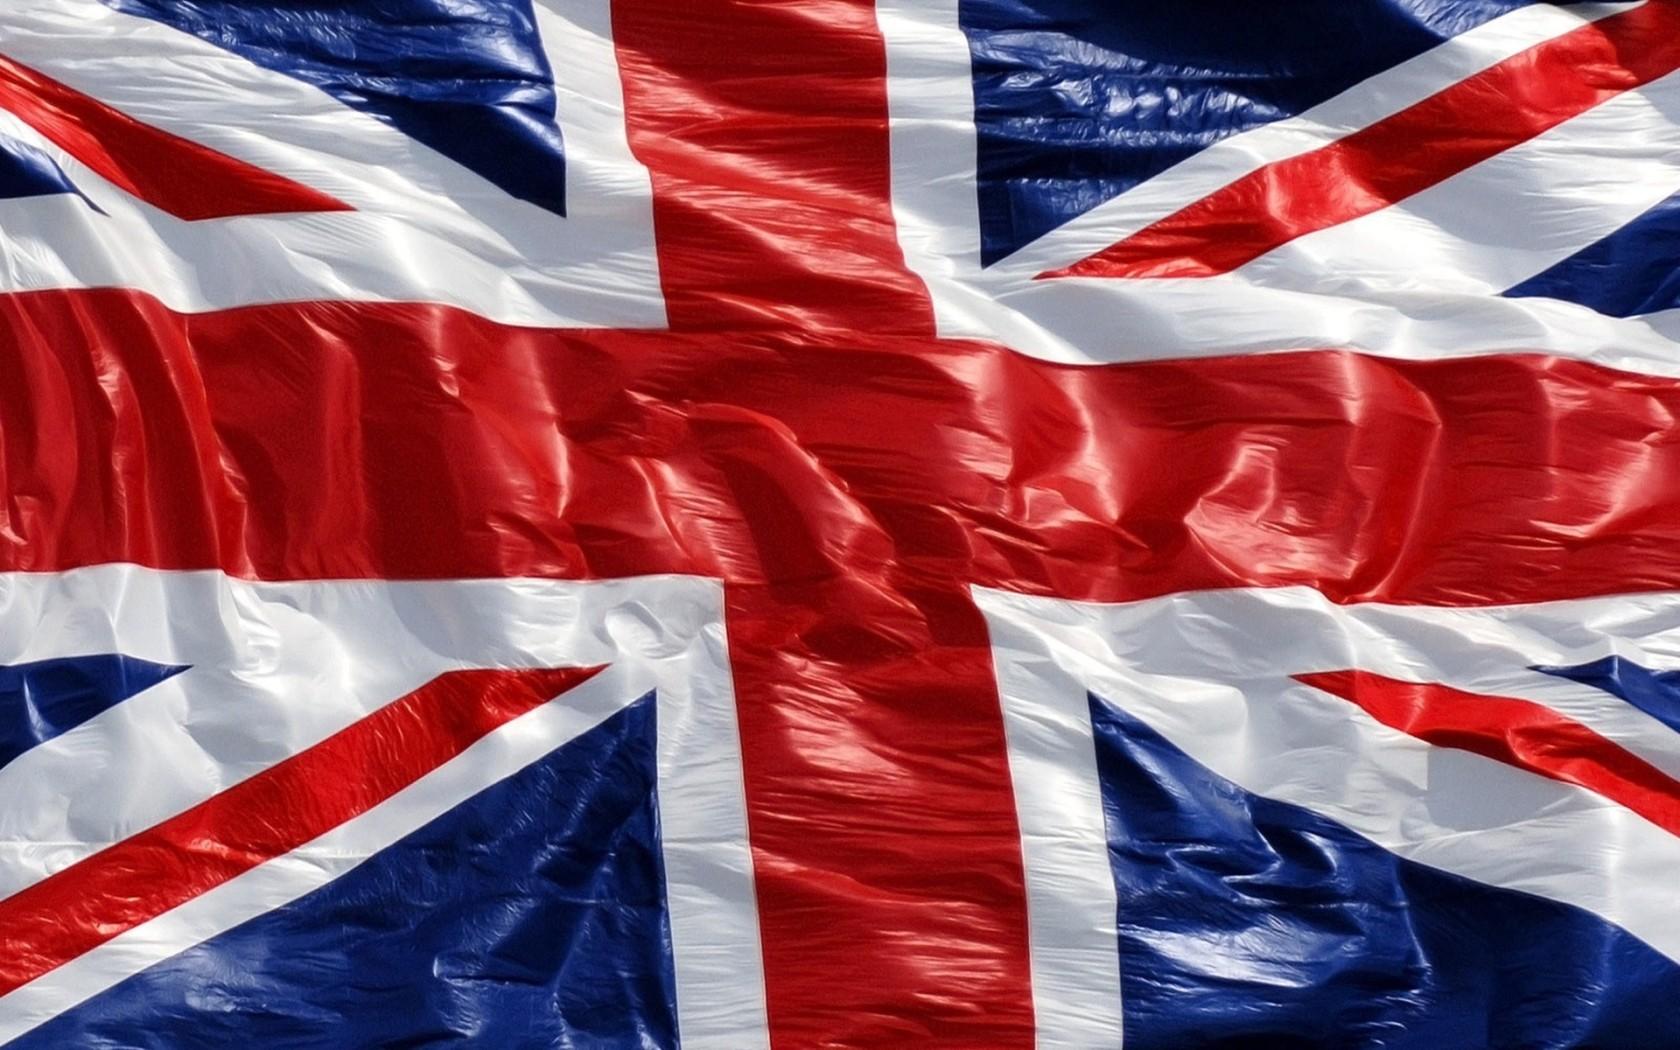 Английский флаг флаг добавил silvery 2011 03